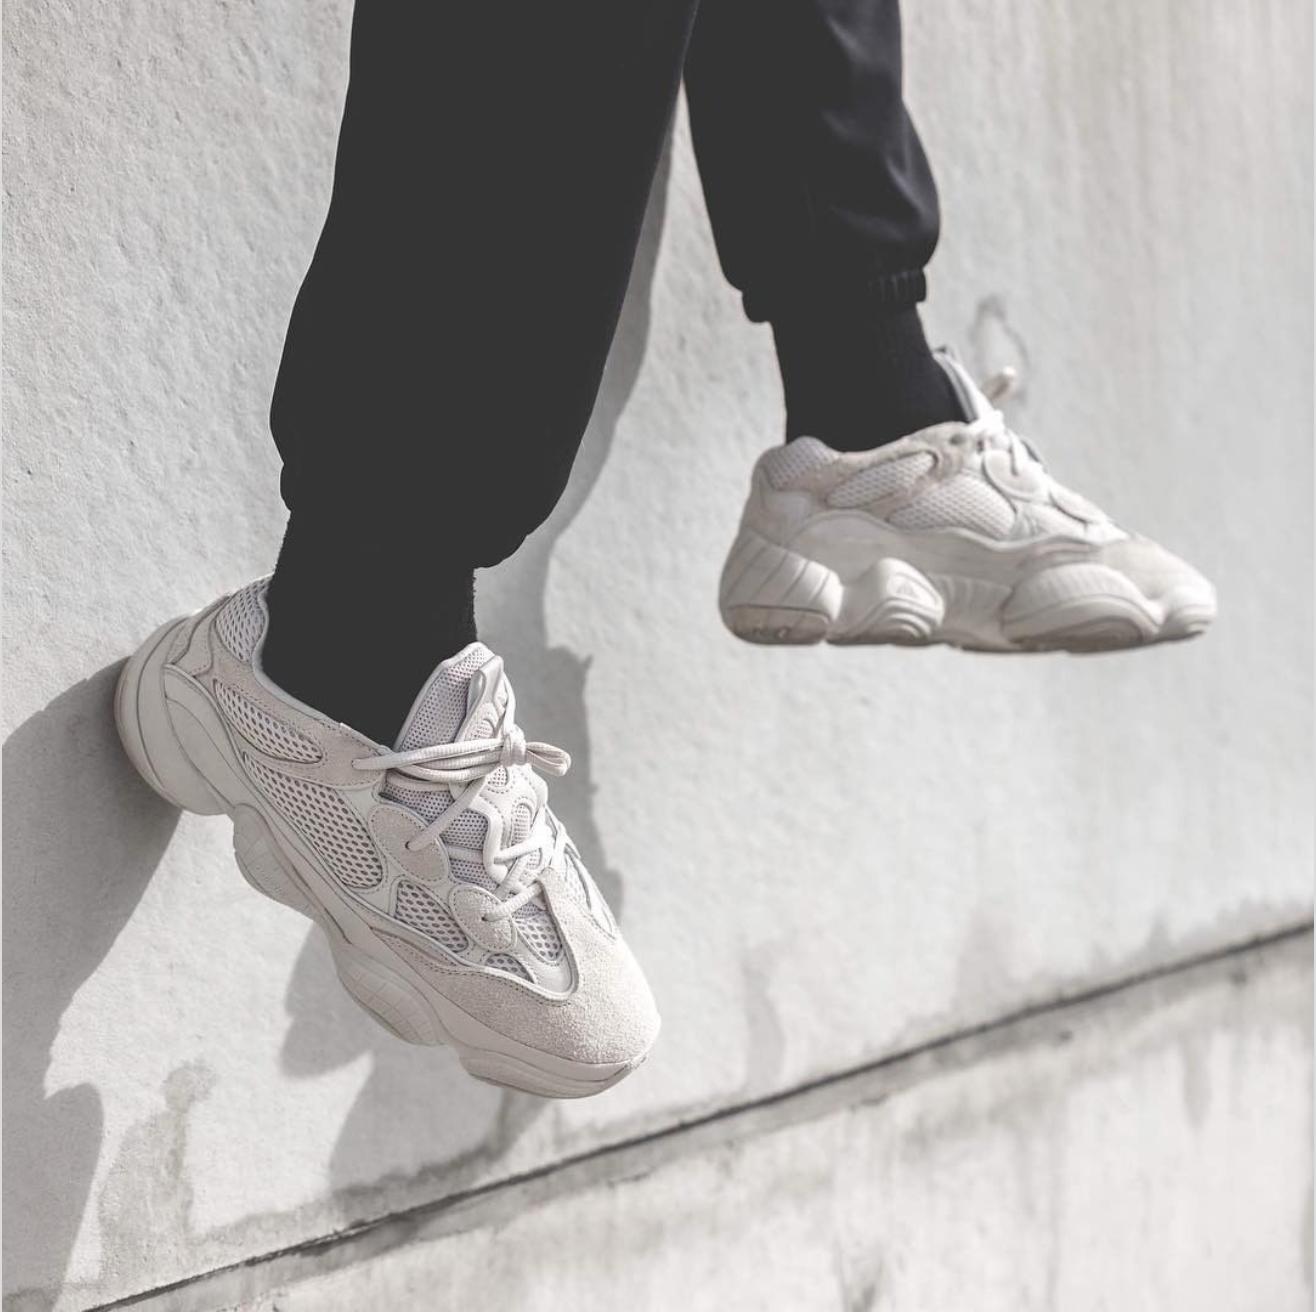 12e3a28ccd637 adidas Yeezy 500  Desert Rat  - Sneaker Myth